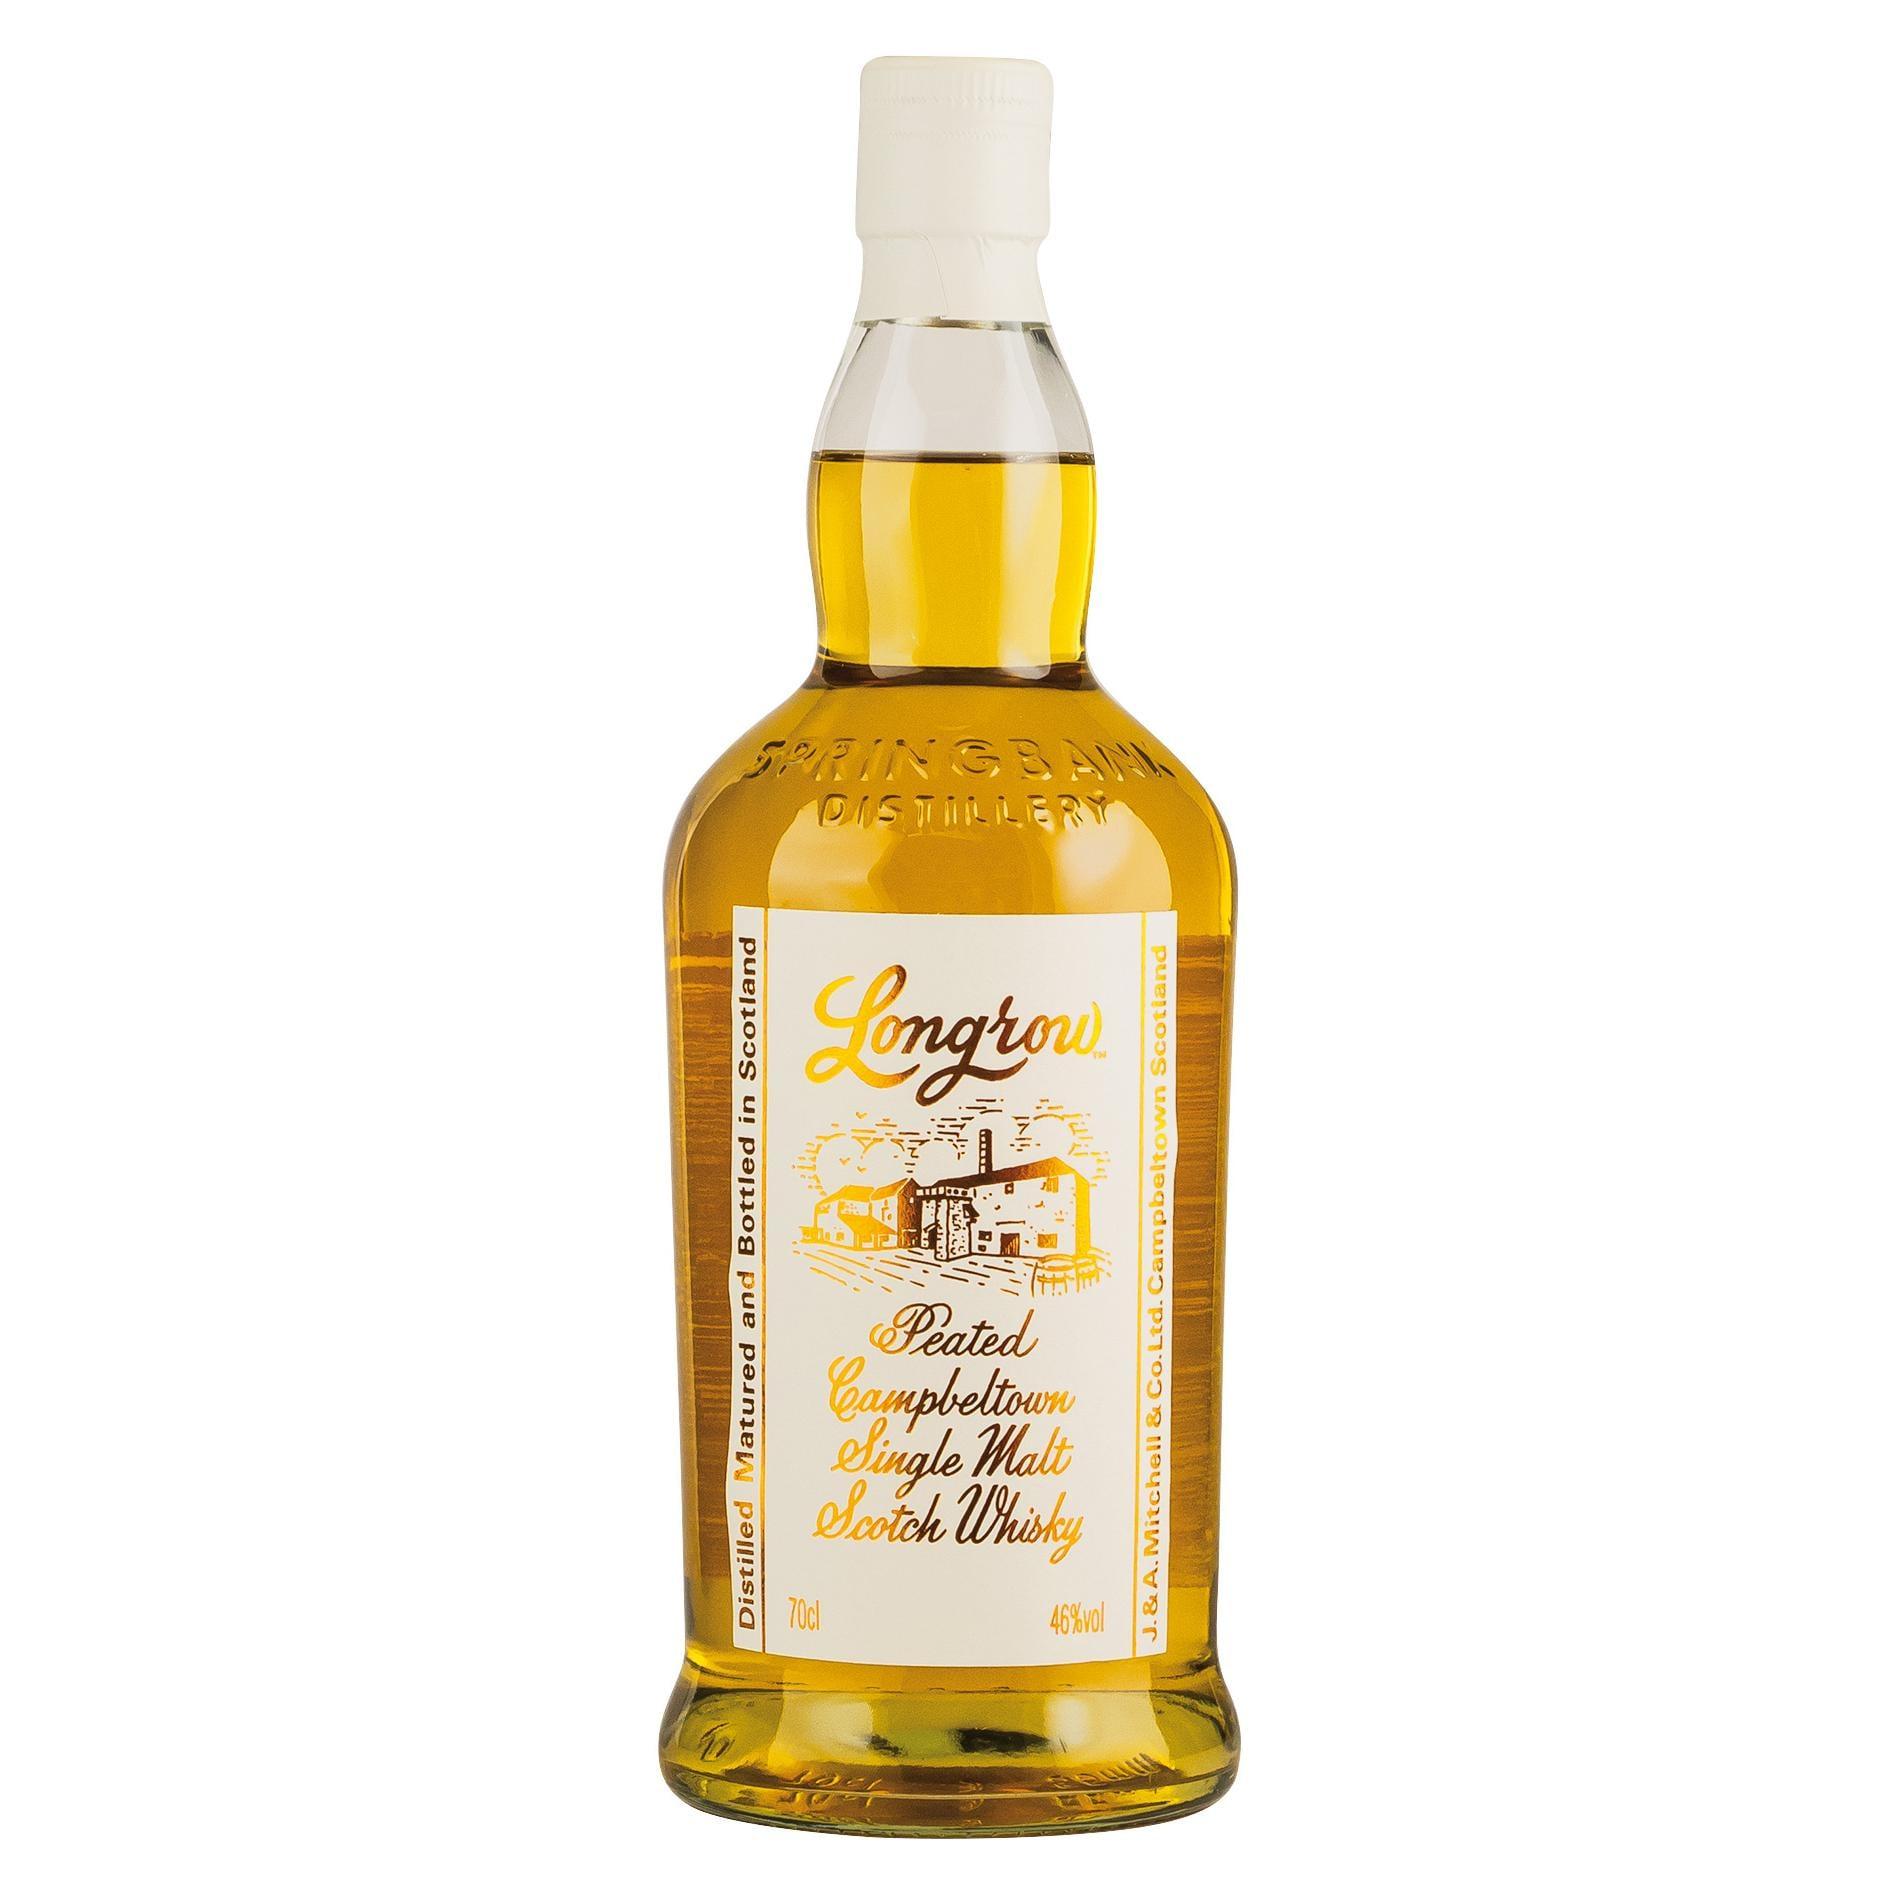 Longrow Peated Campbeltown Single Malt Scotch Whisky 0,7l